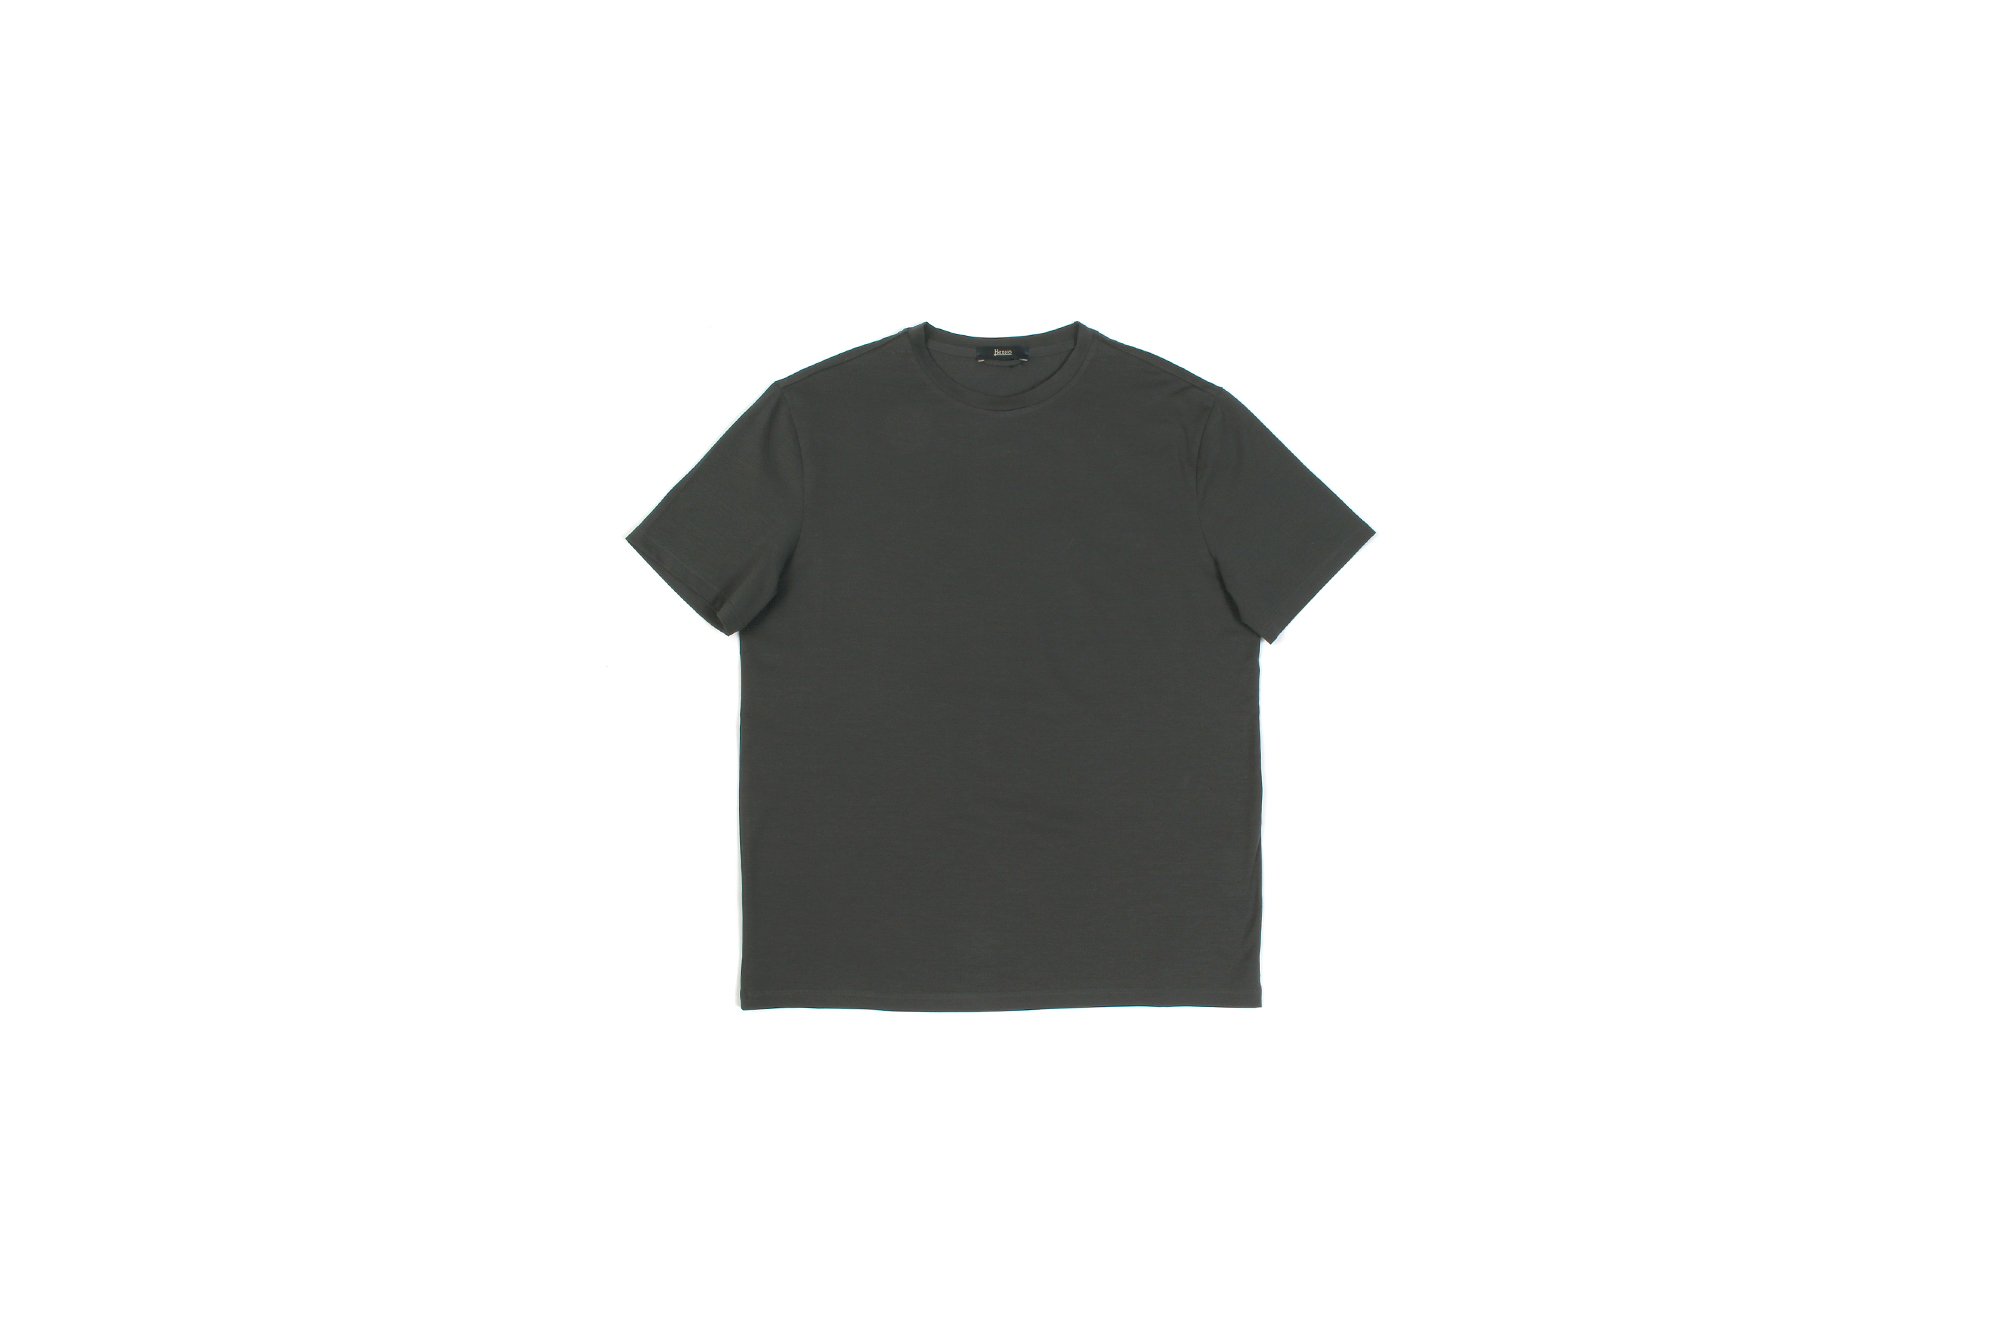 HERNO (ヘルノ) Cotton Stretch Crew Neck T-shirt (コットン ストレッチ クルーネック Tシャツ) クルーネック Tシャツ CHARCOAL (チャコール・9480) 2021 春夏新作 Alto e Diritto altoediritto アルトエデリット Tee